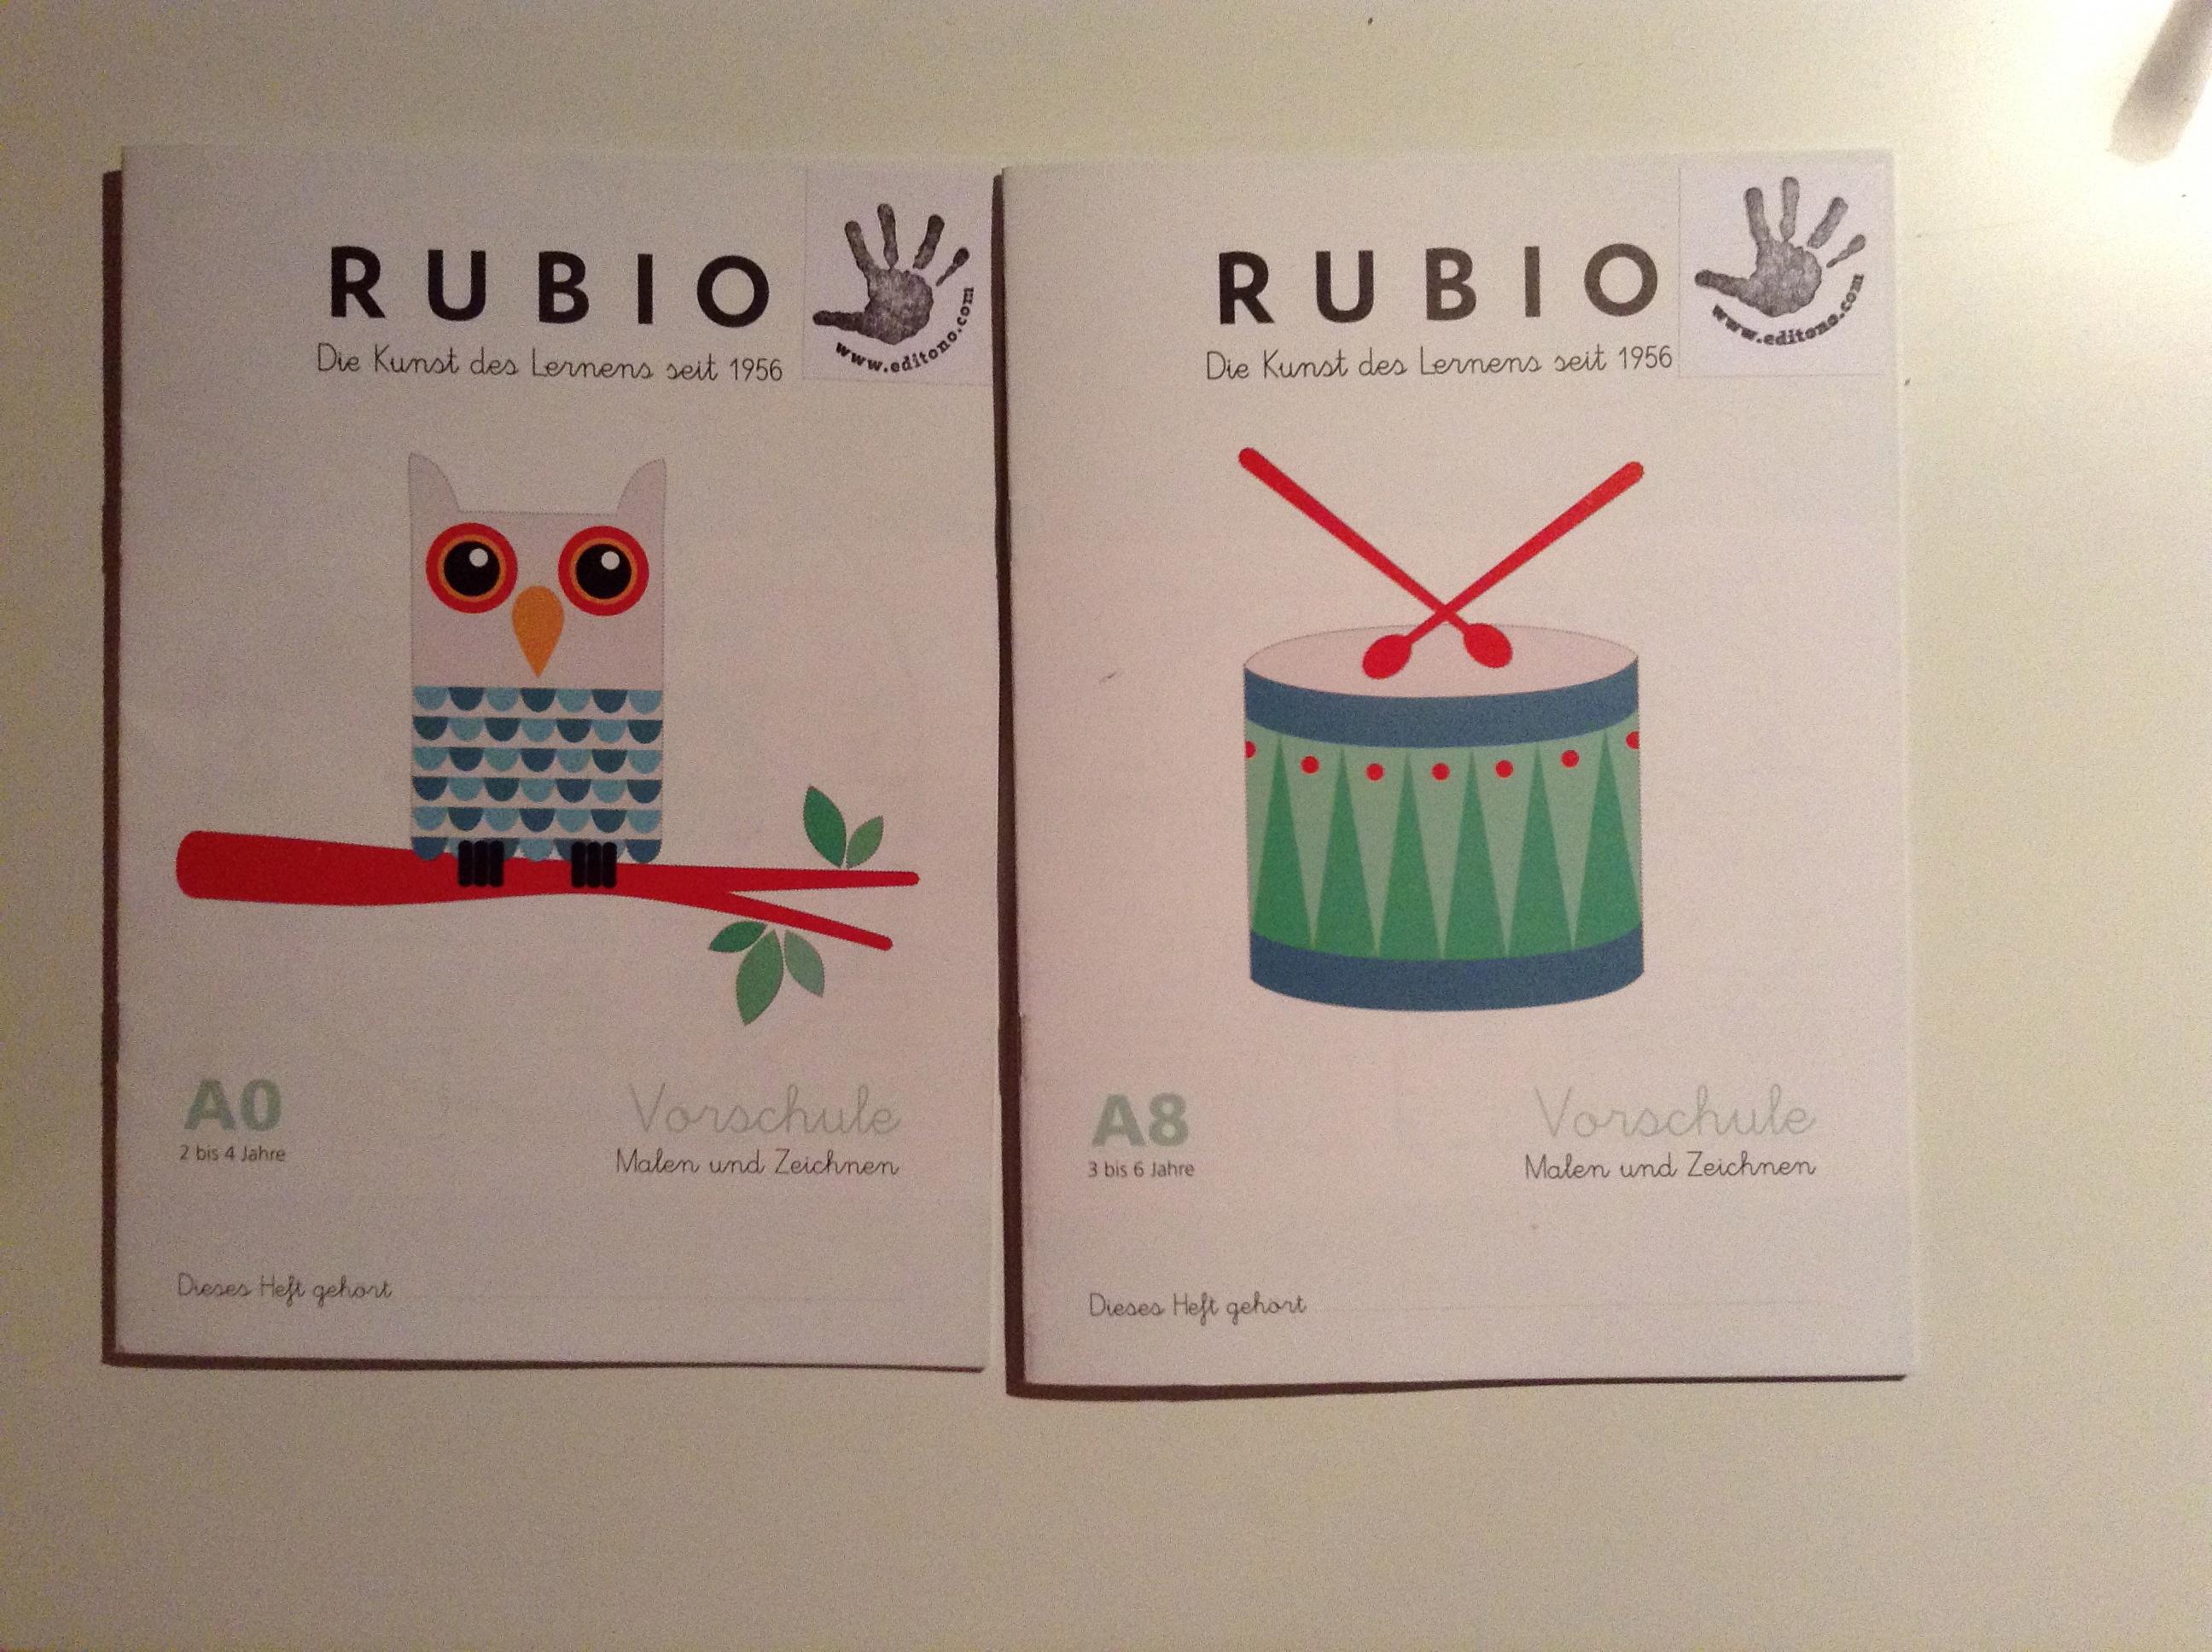 Rubio 1